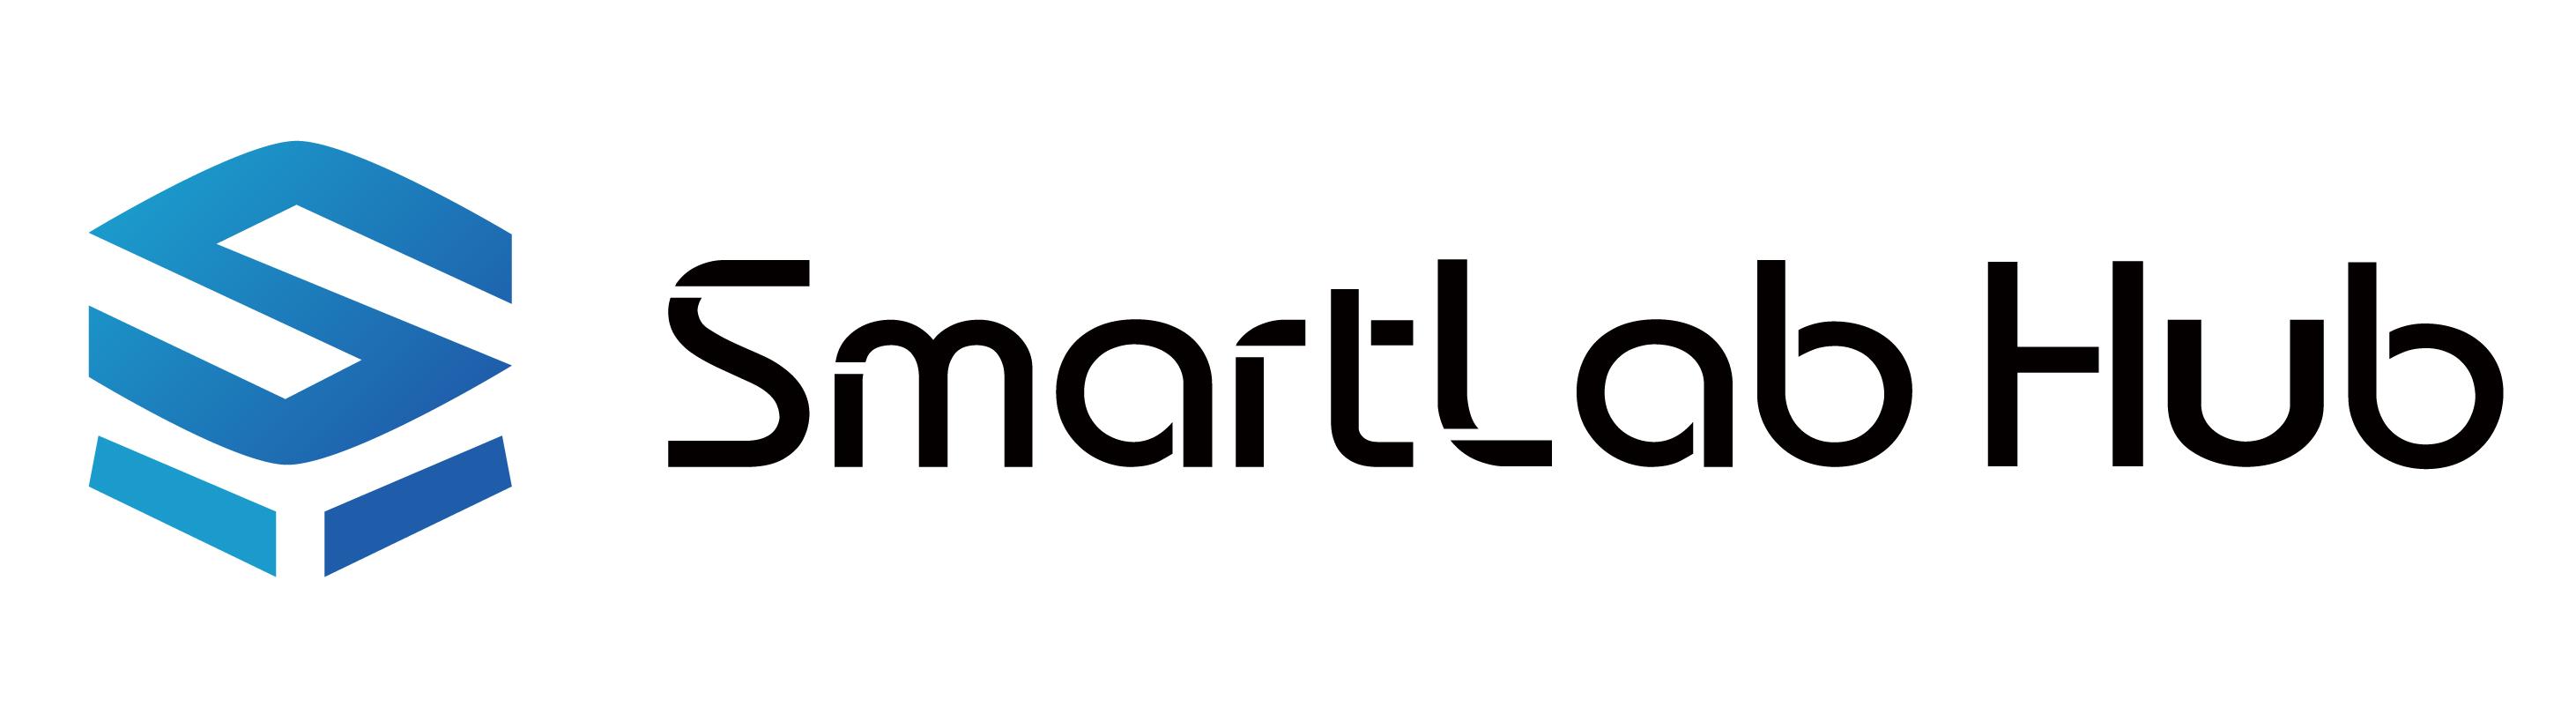 SmartLab Hub Online Store